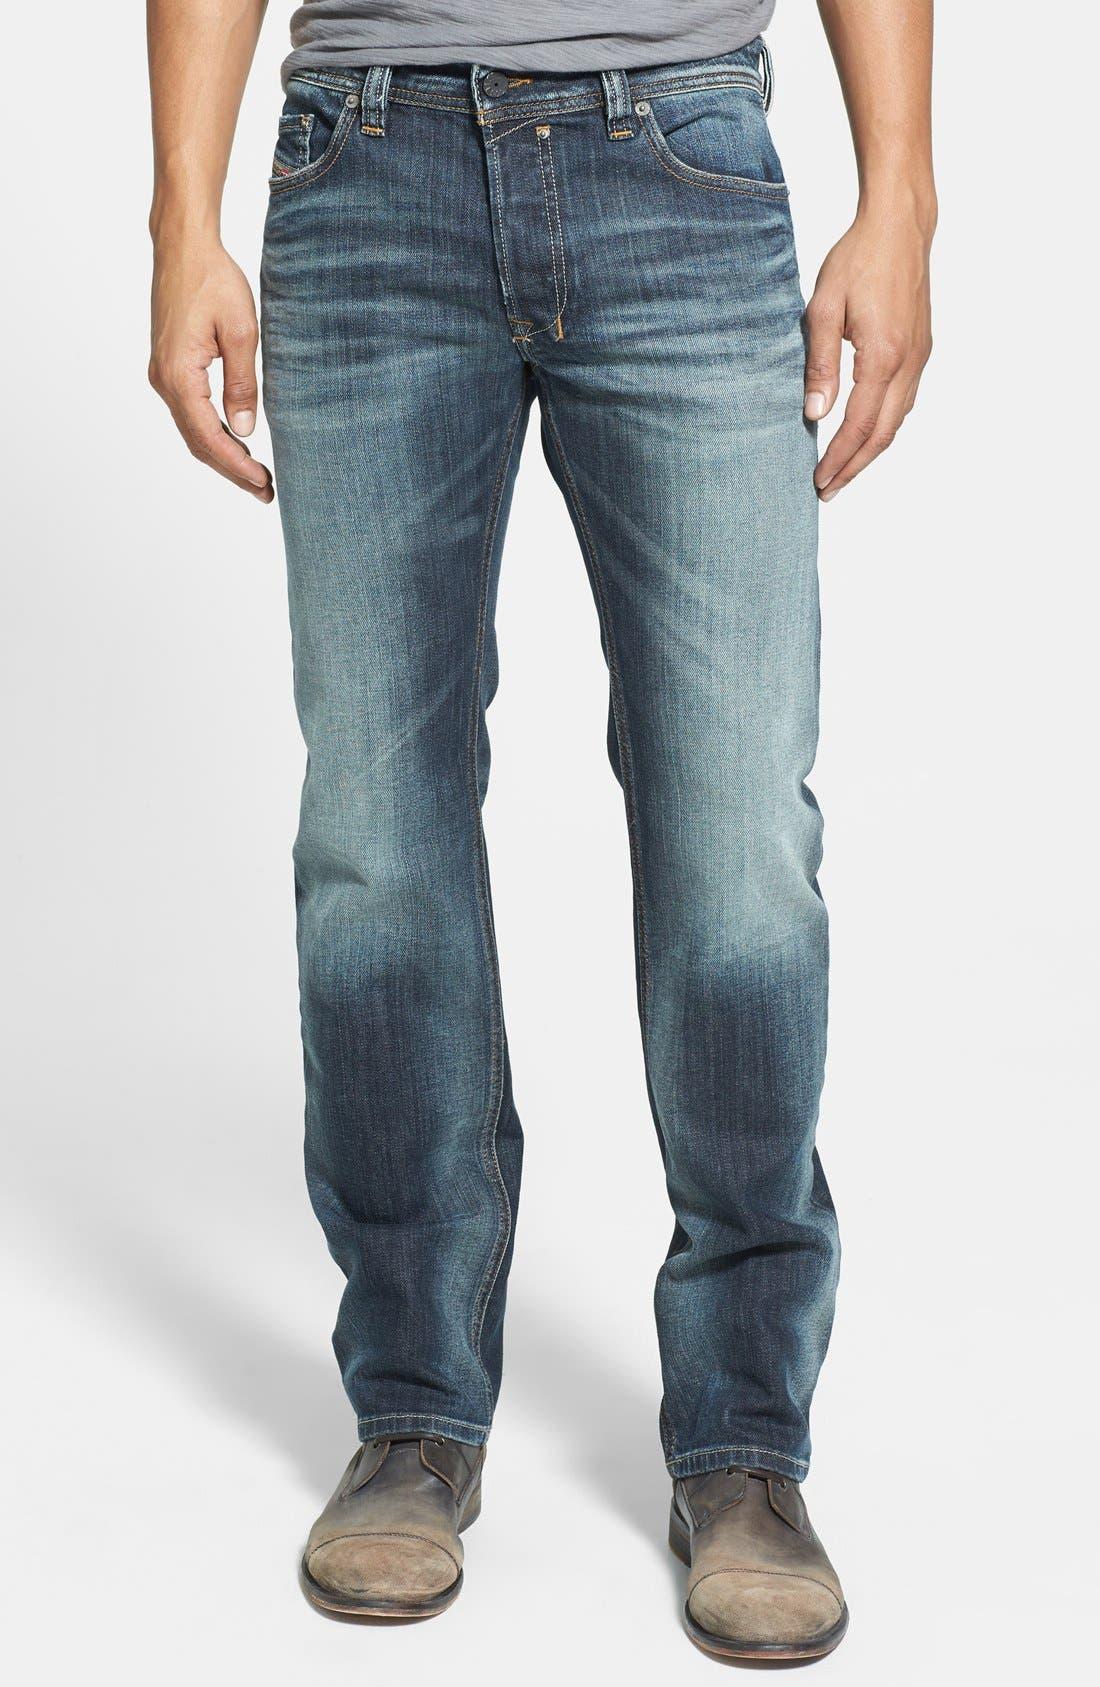 Safado Slim Fit Jeans,                         Main,                         color, 885K